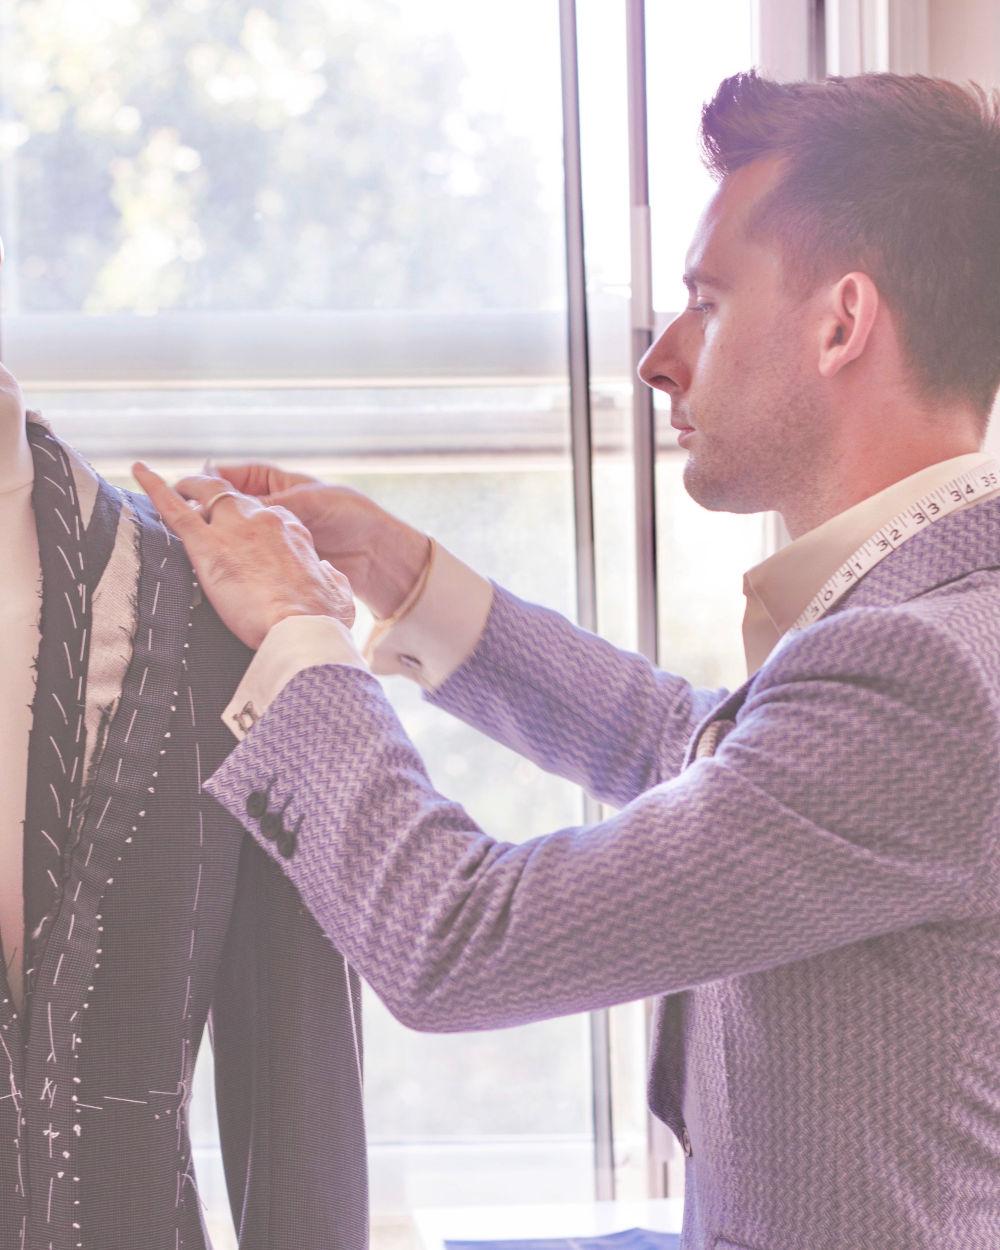 Bespoke tailoring experience at Pratt & Prasad